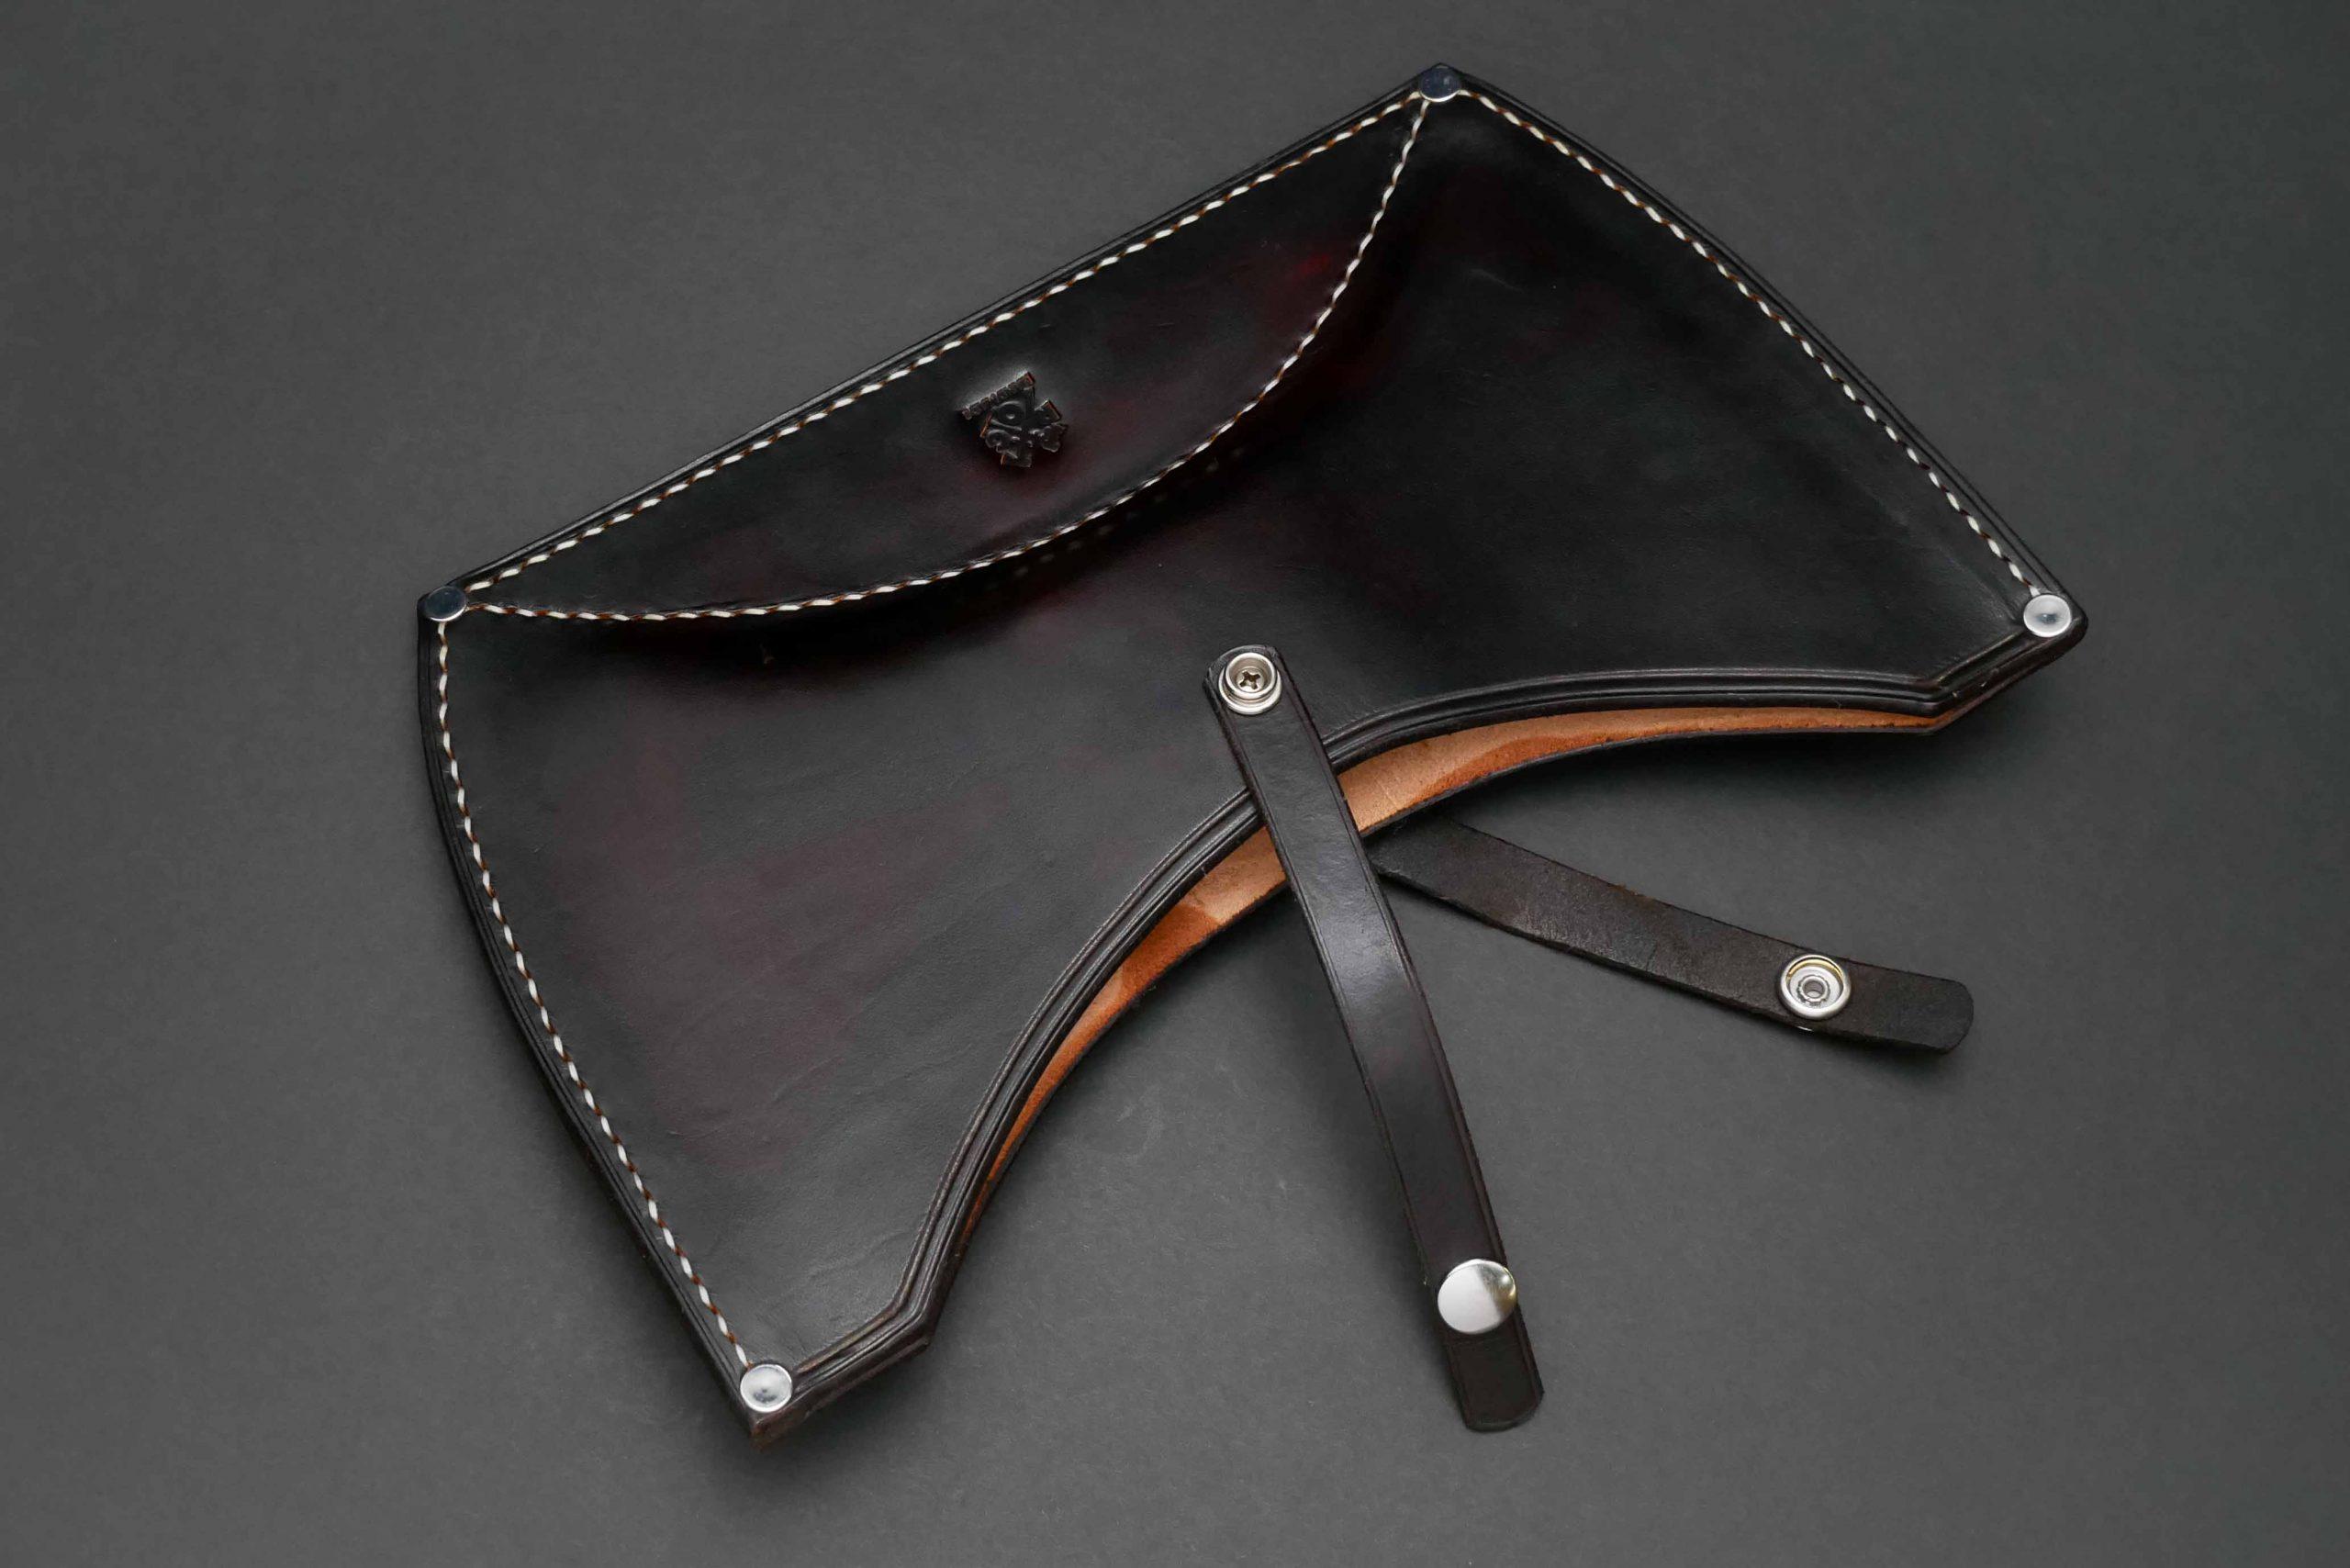 Gransfors Bruks Double Bit Axe Custom Leather Sheath